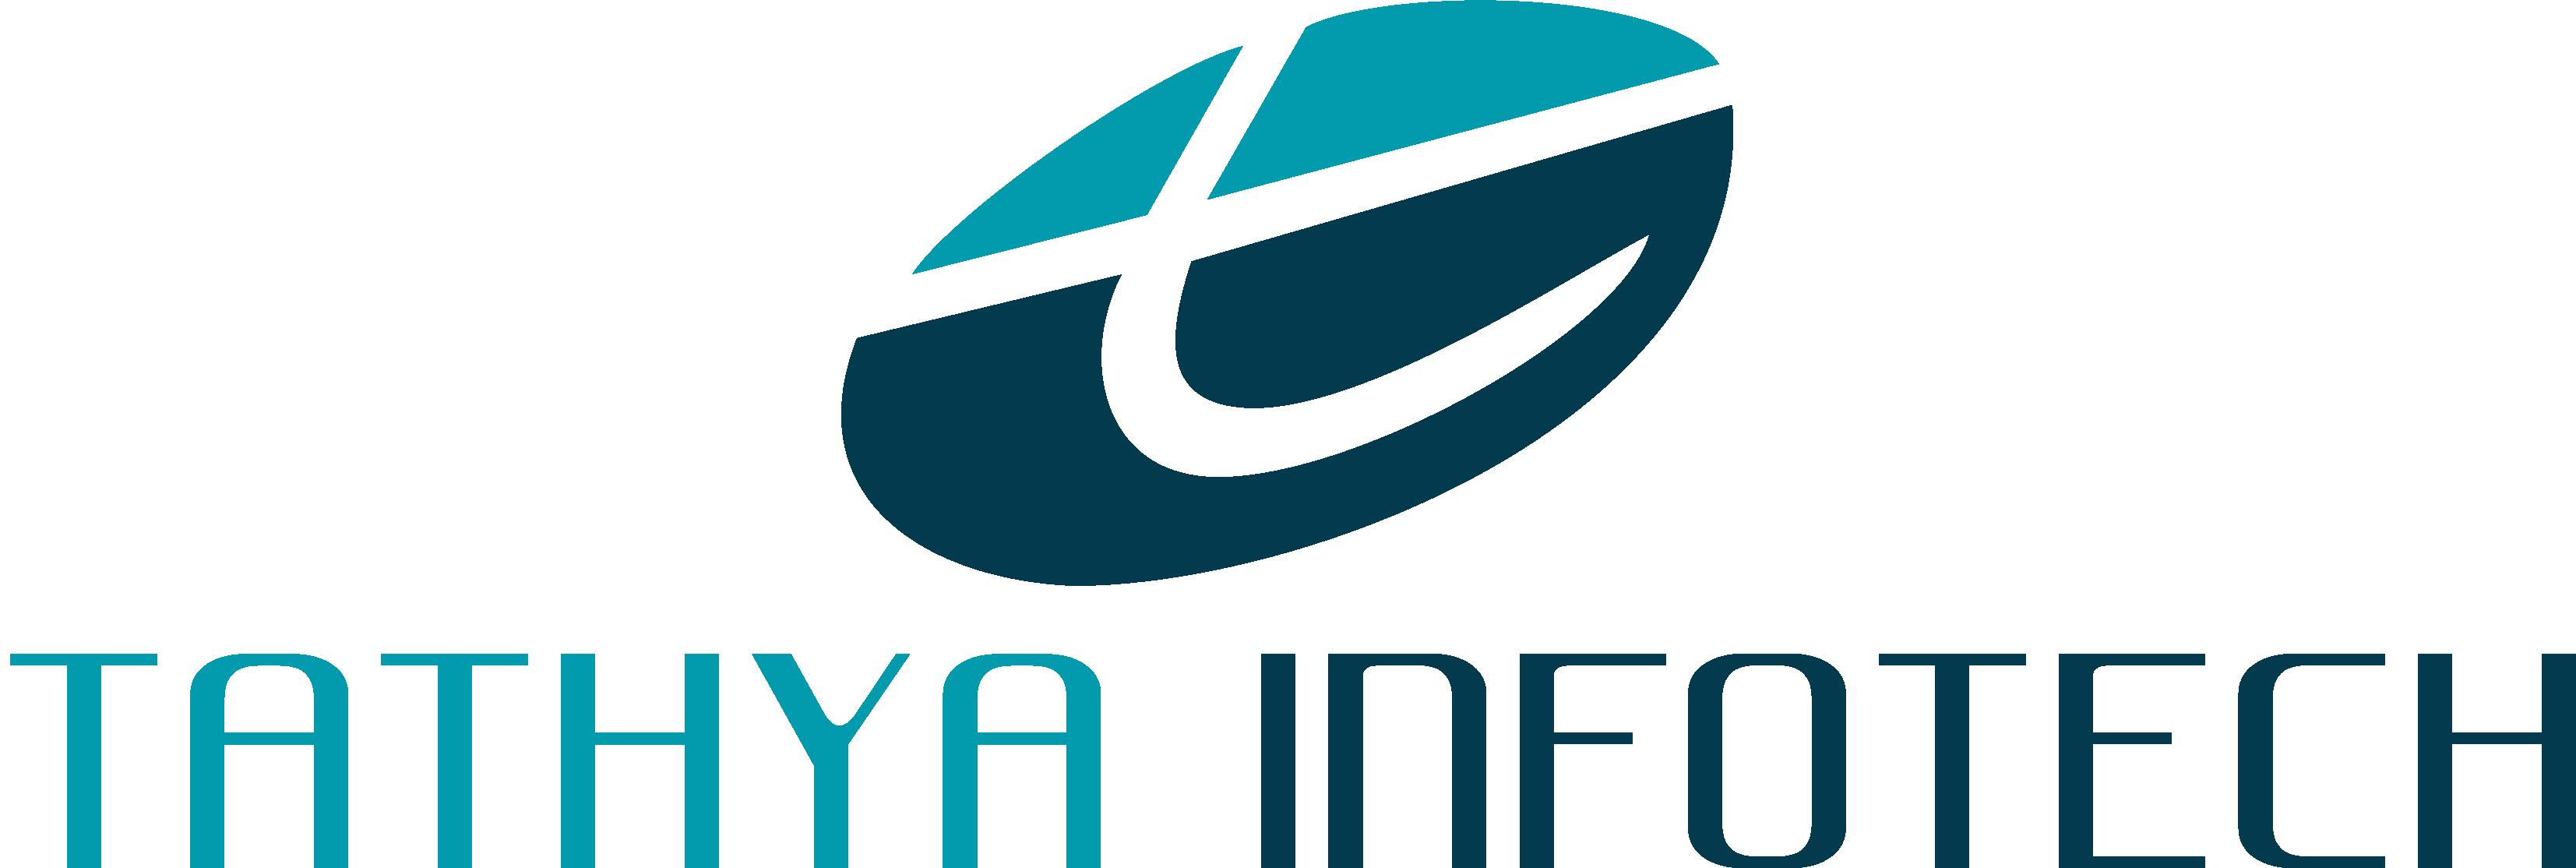 Tathya Infotech Pvt. Ltd. - Logo Design company logo